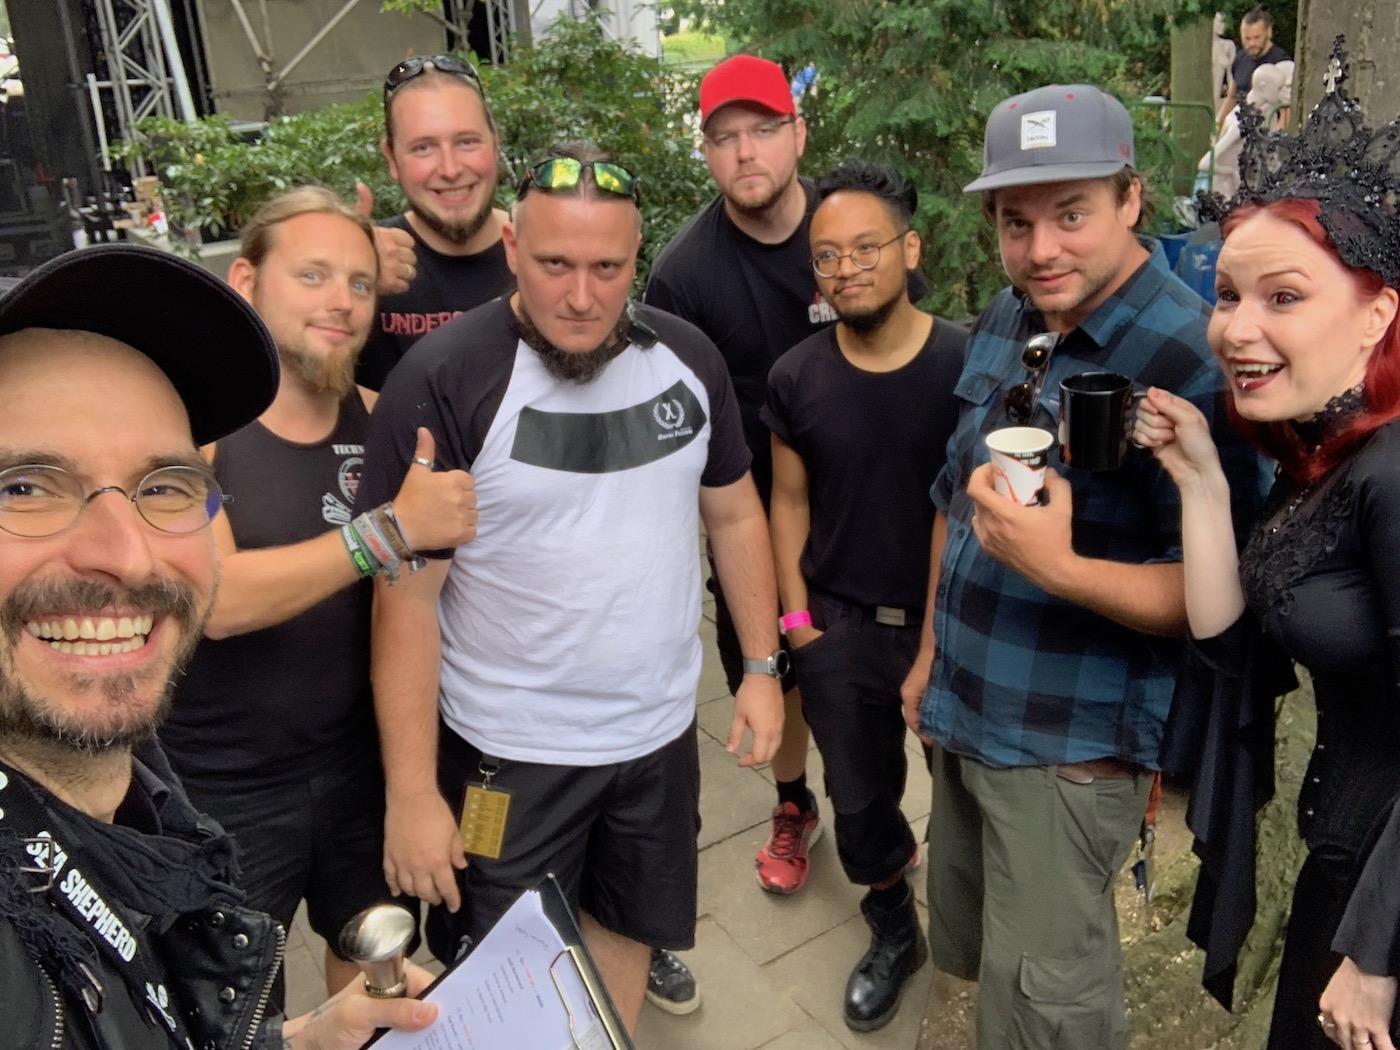 mark_benecke_amphi_festival_koeln_2019 - 128.jpg